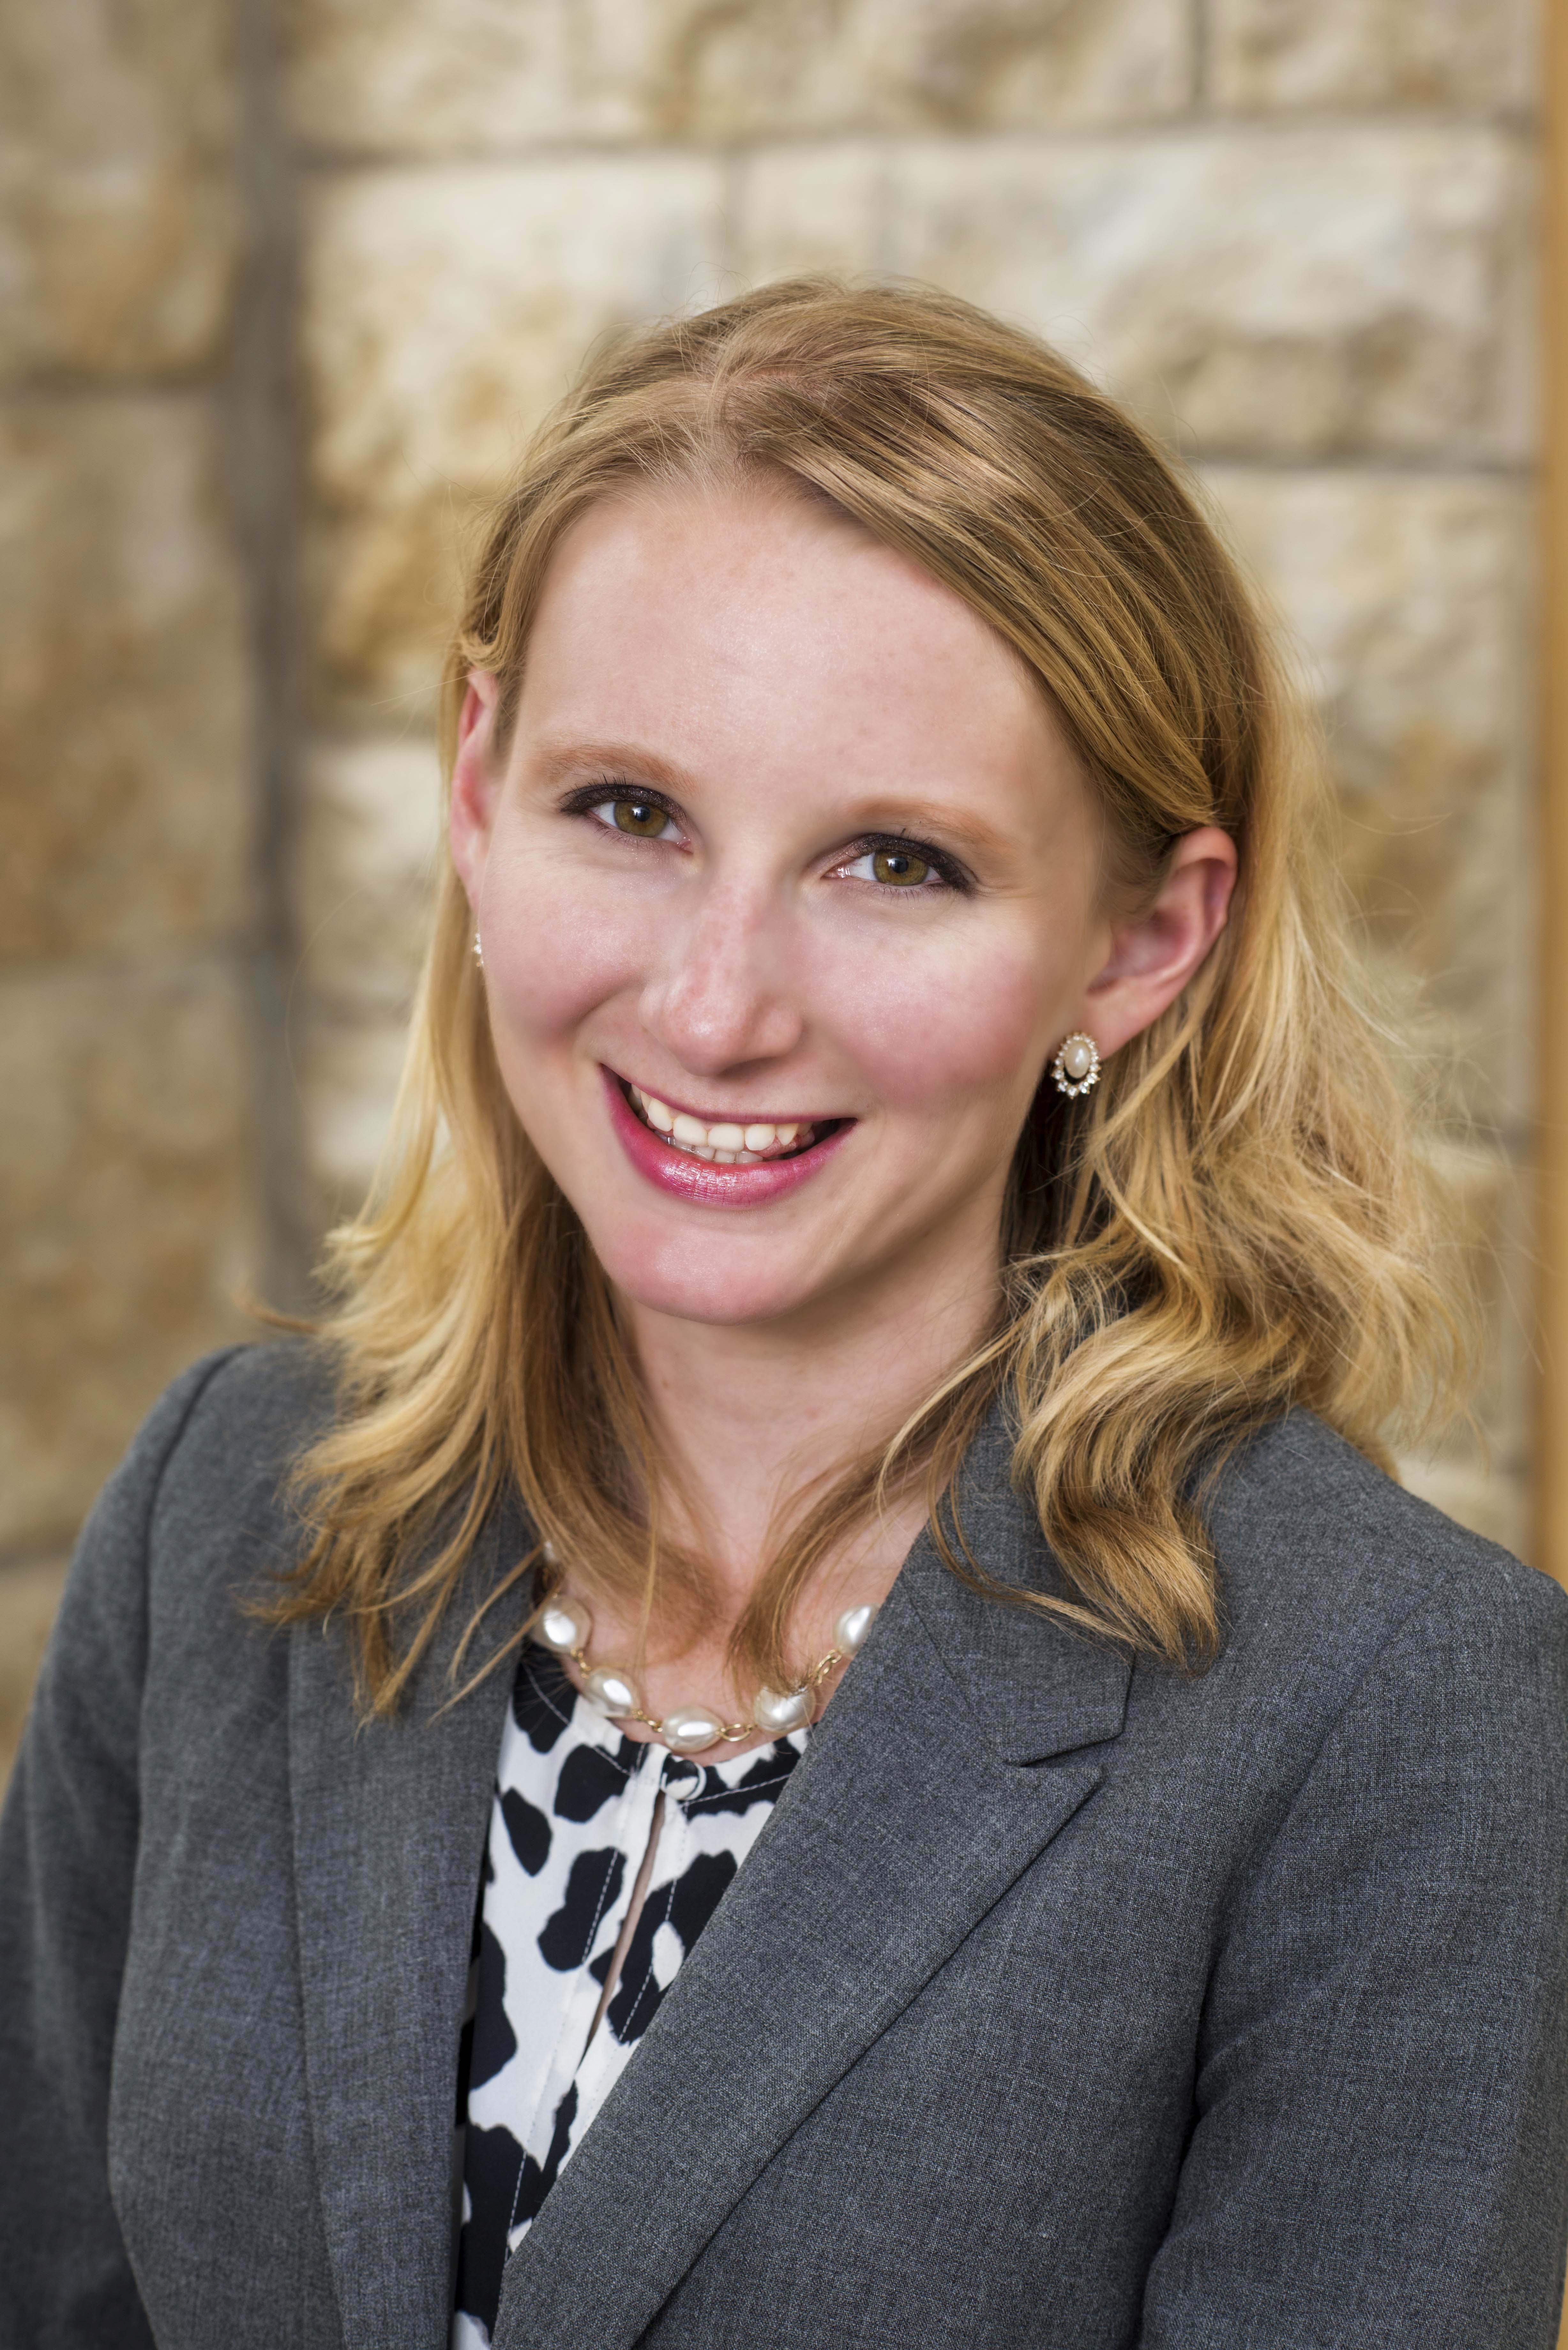 Megan Rosa-Caldwell